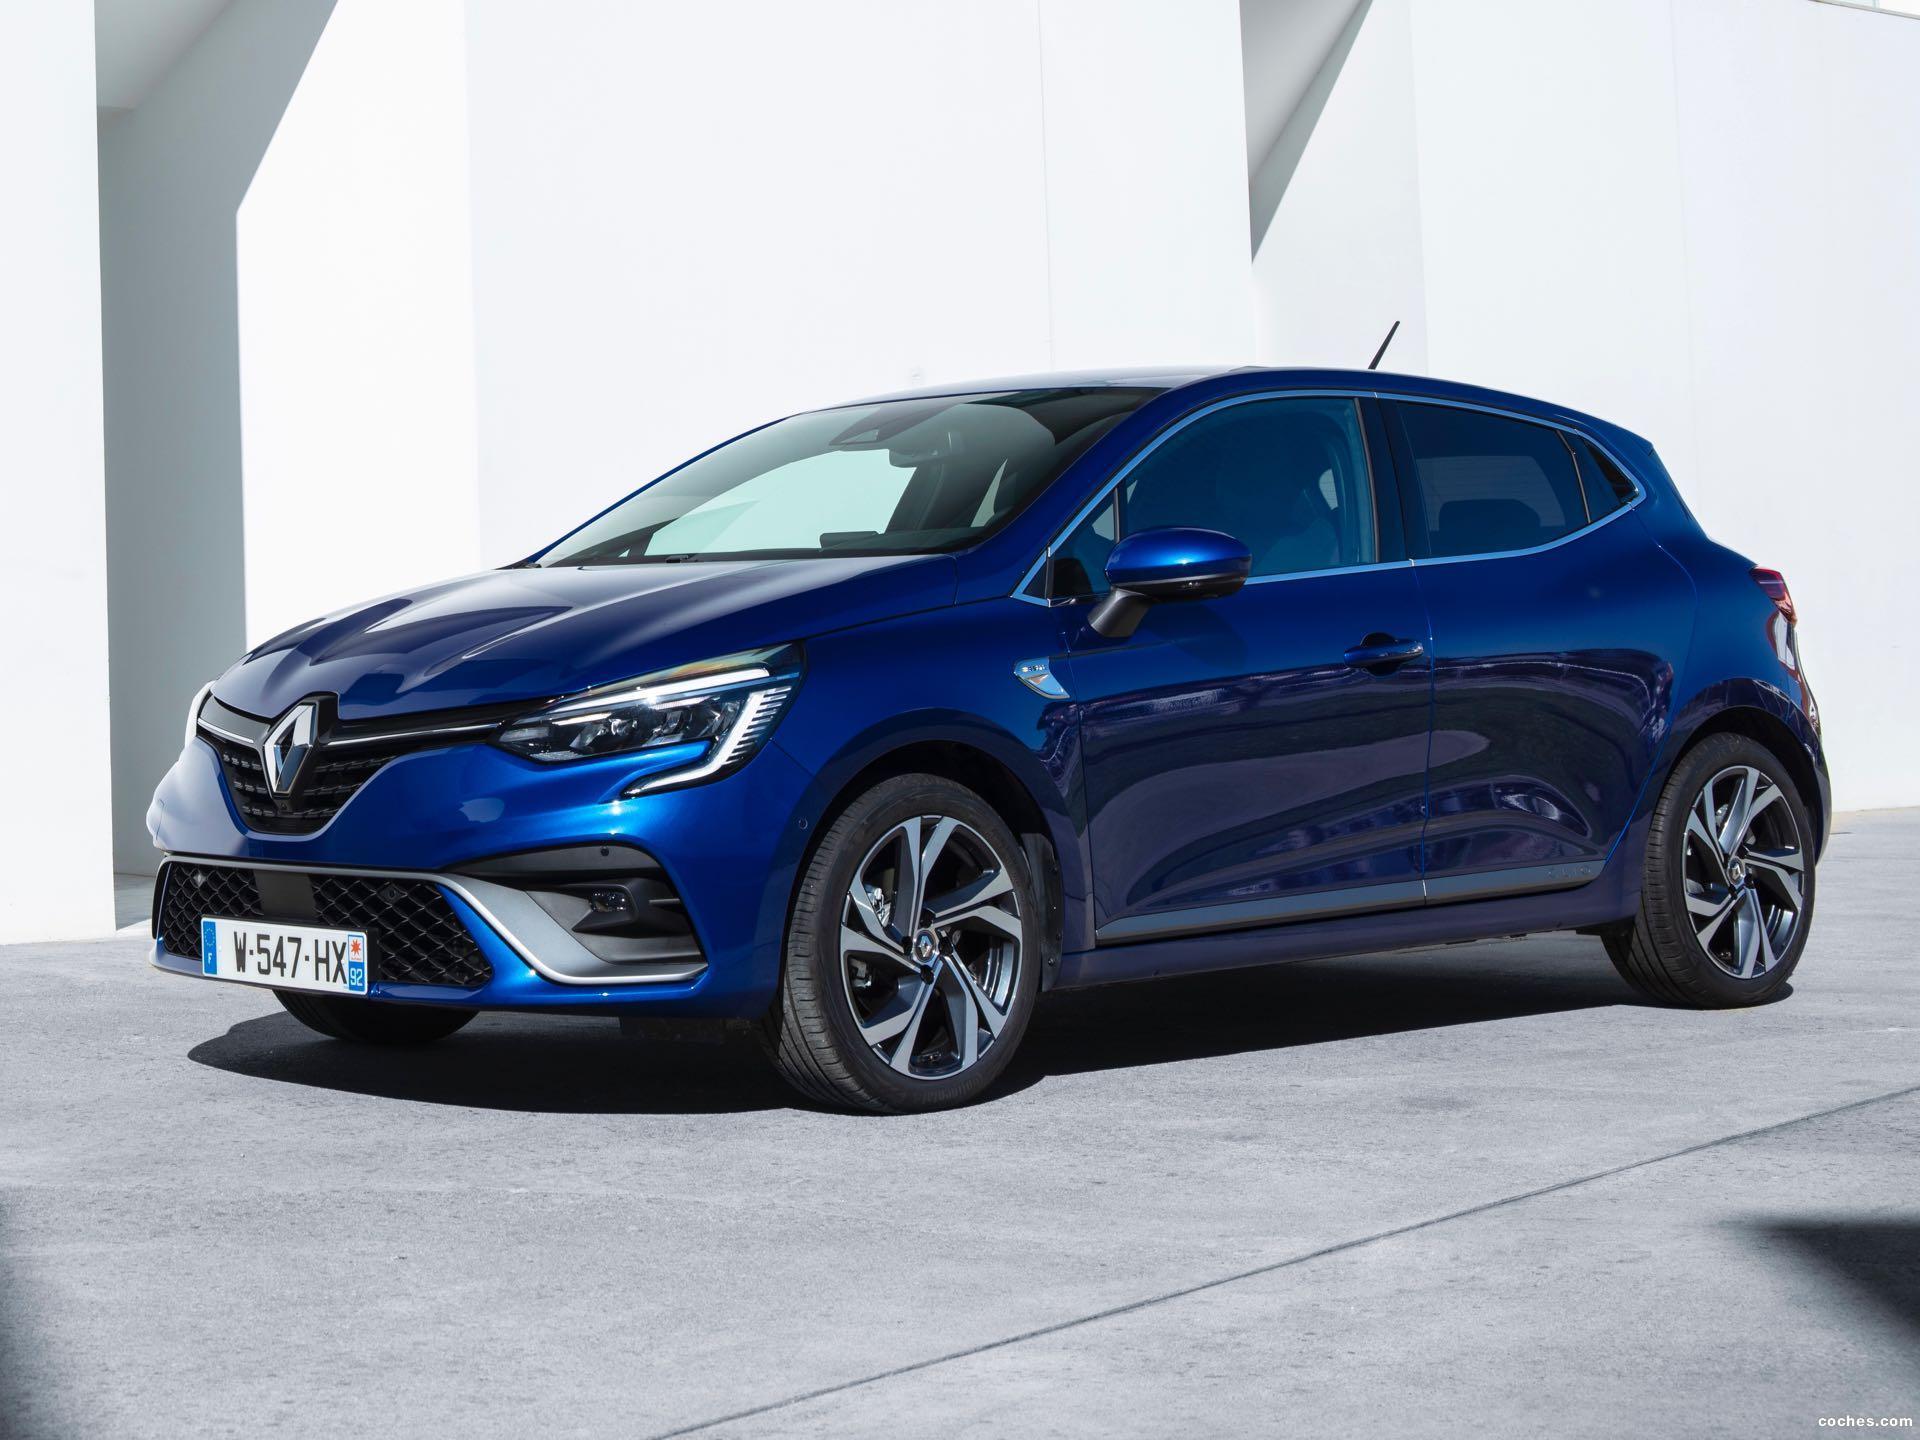 Foto 10 de Renault Clio R.S. Line 2019